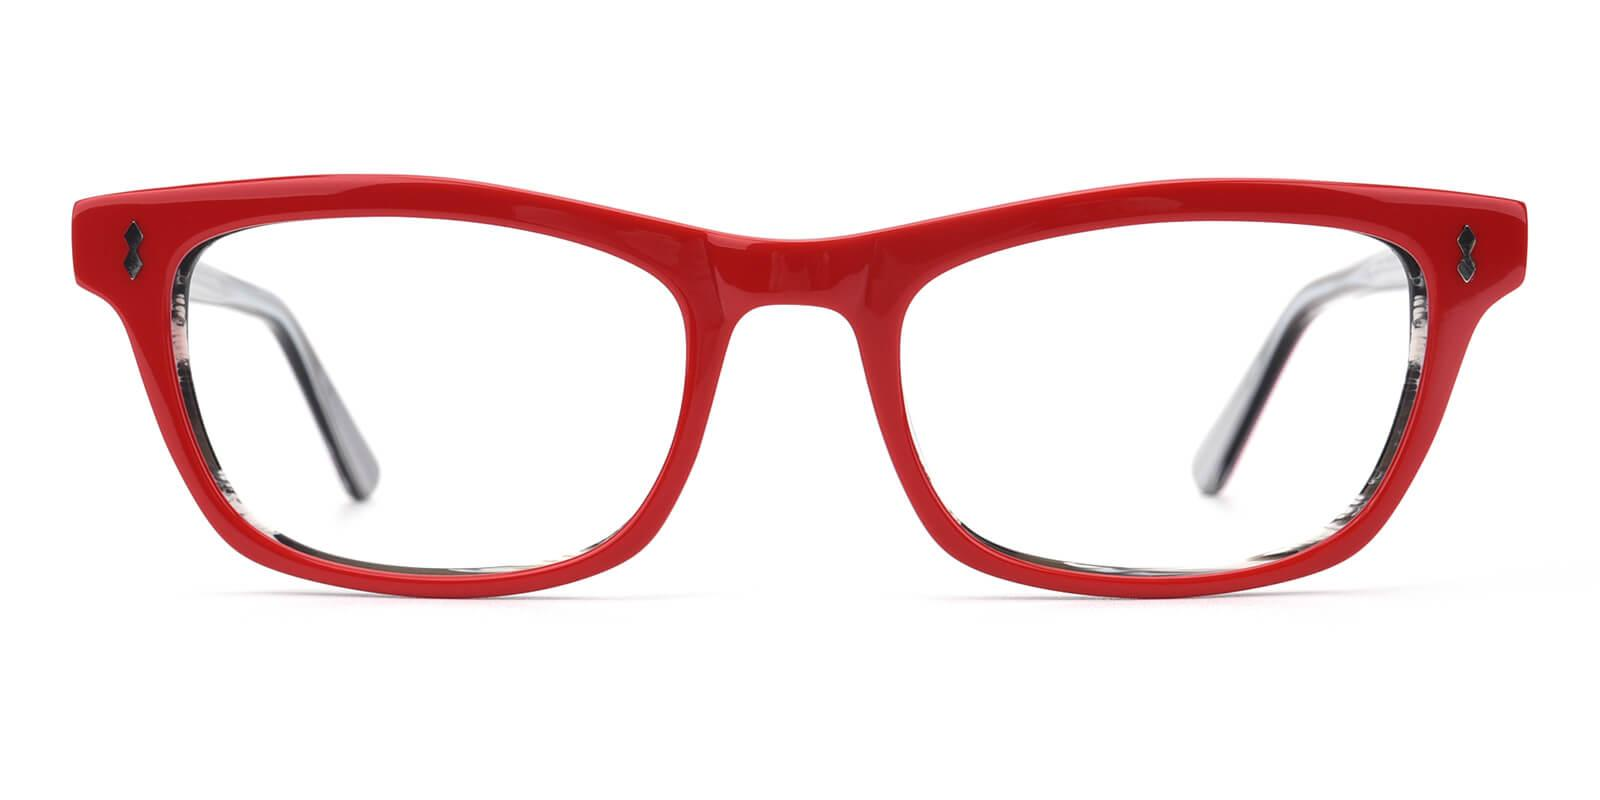 Leavary-Red-Rectangle-Acetate-Eyeglasses-additional2